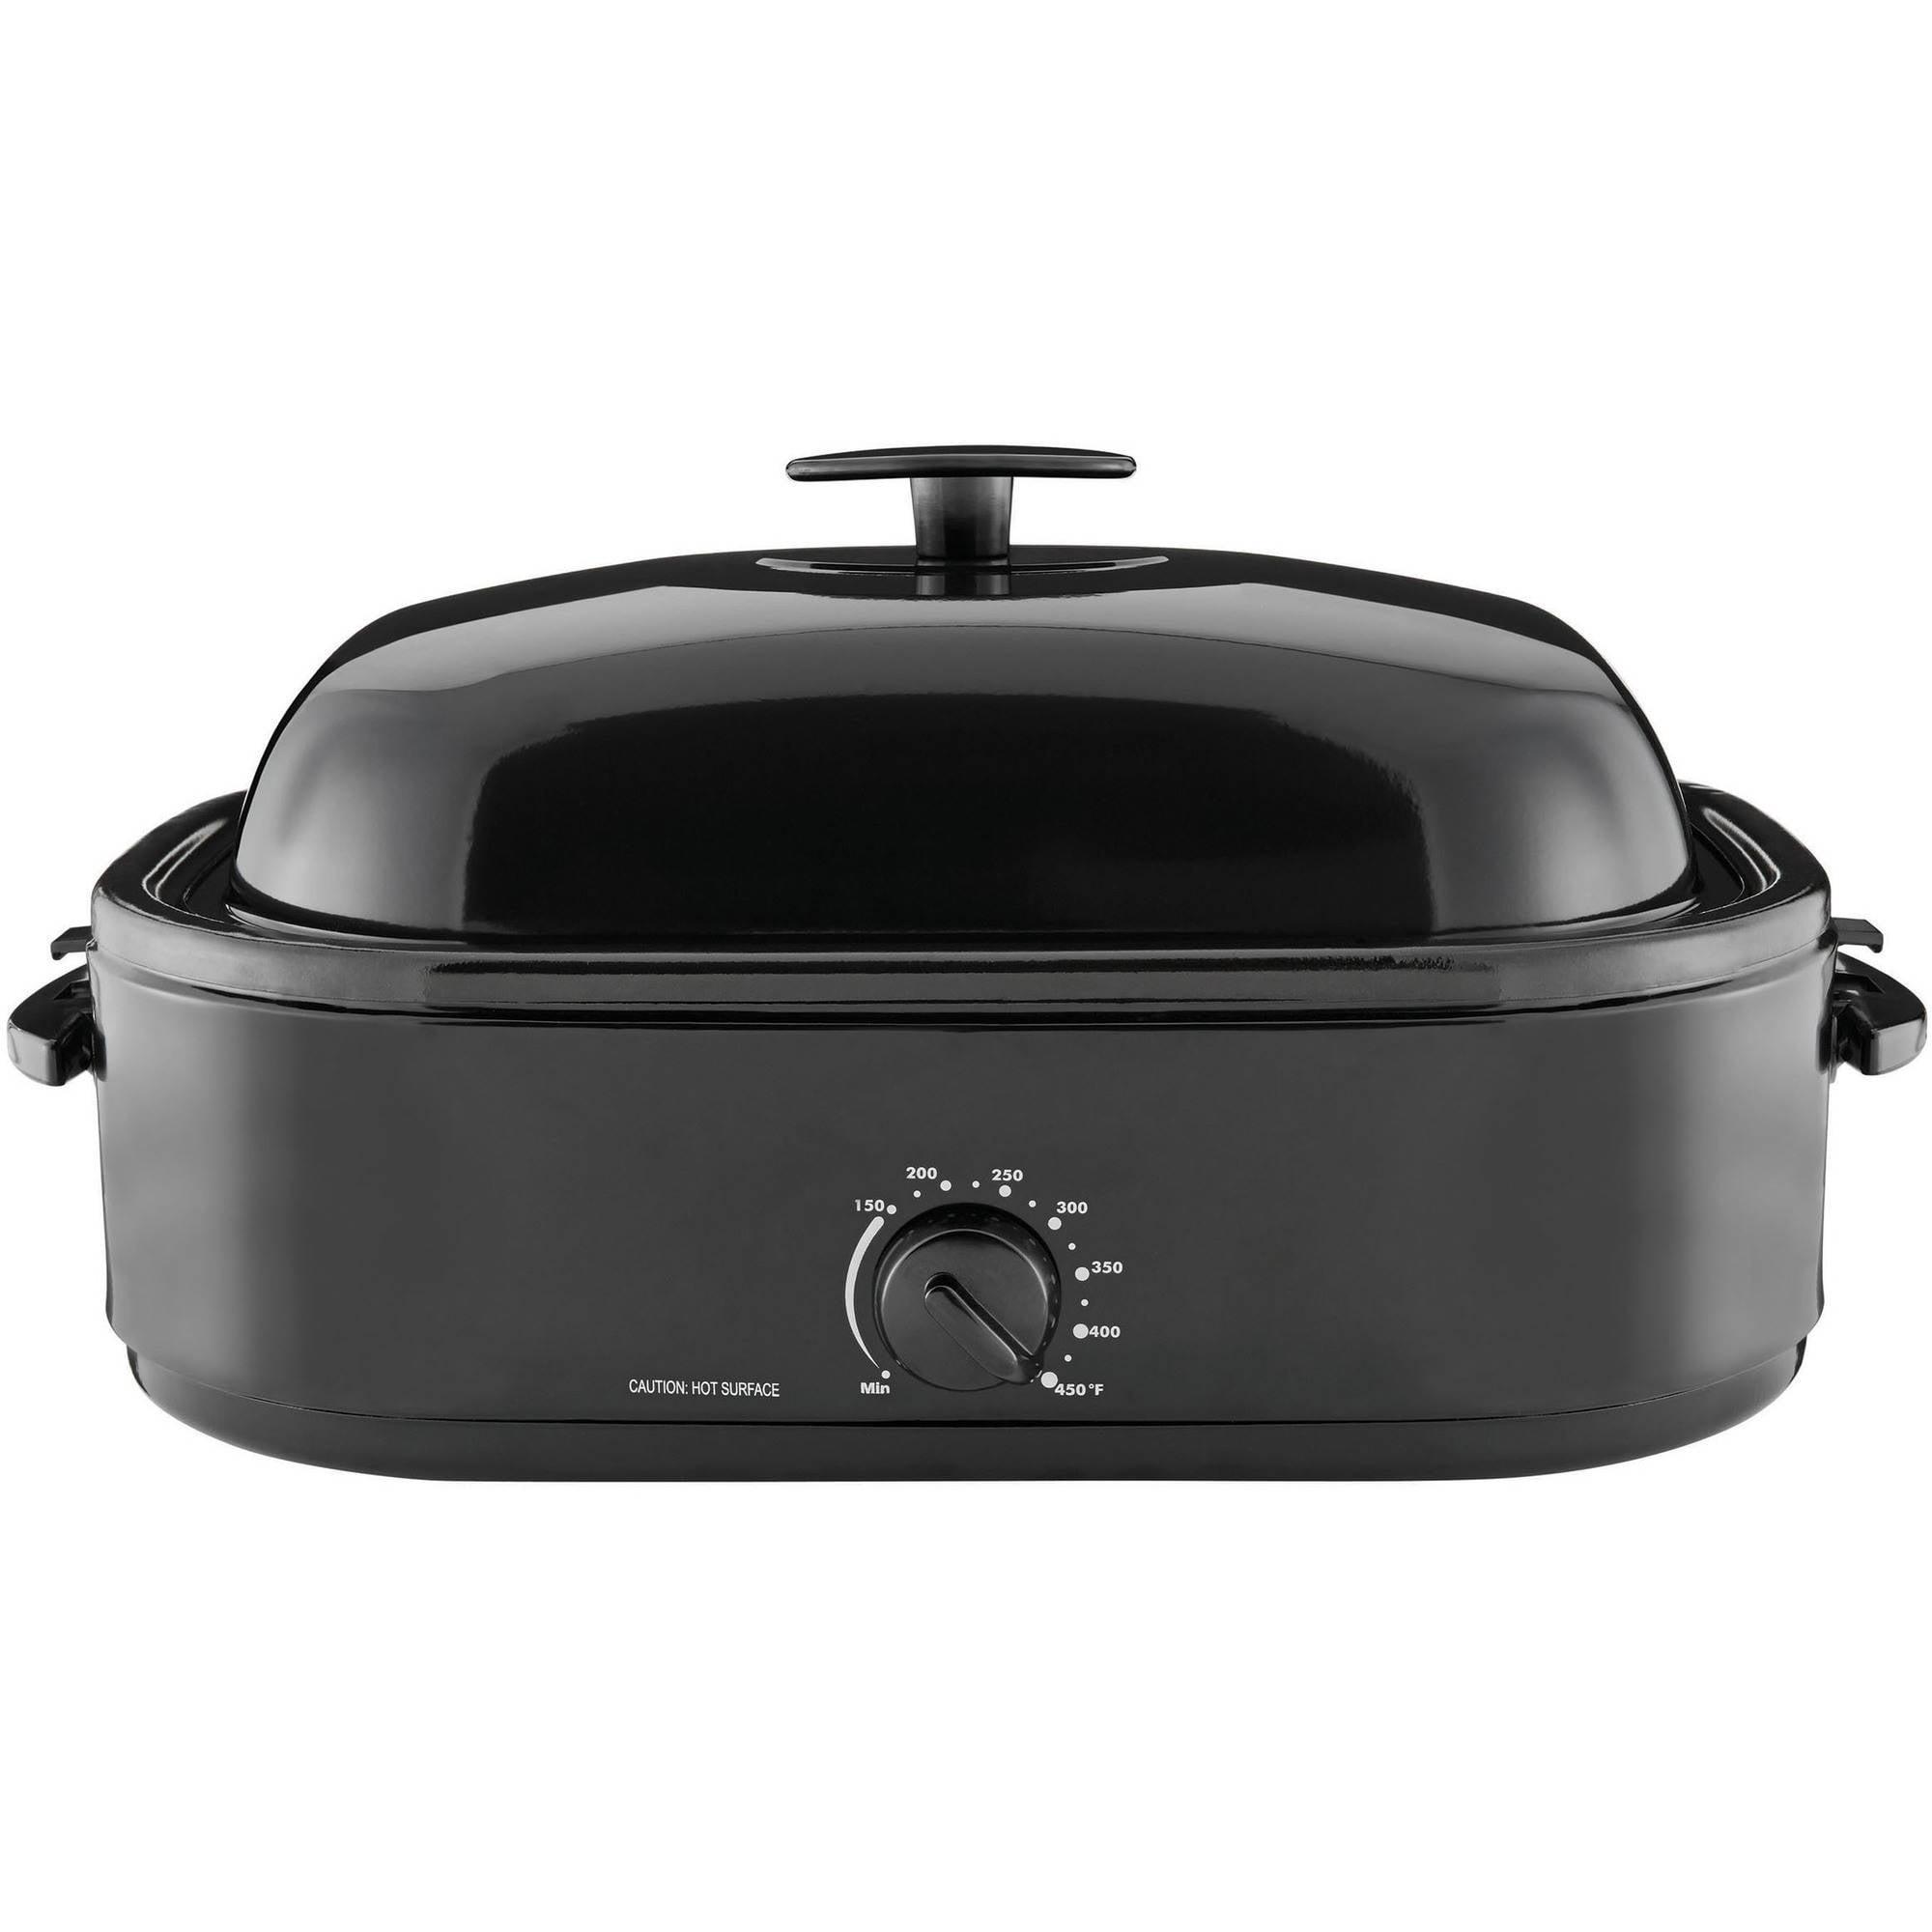 Mainstays 20 Pound 14 Quart Black Turkey Roaster with High-Dome Lid